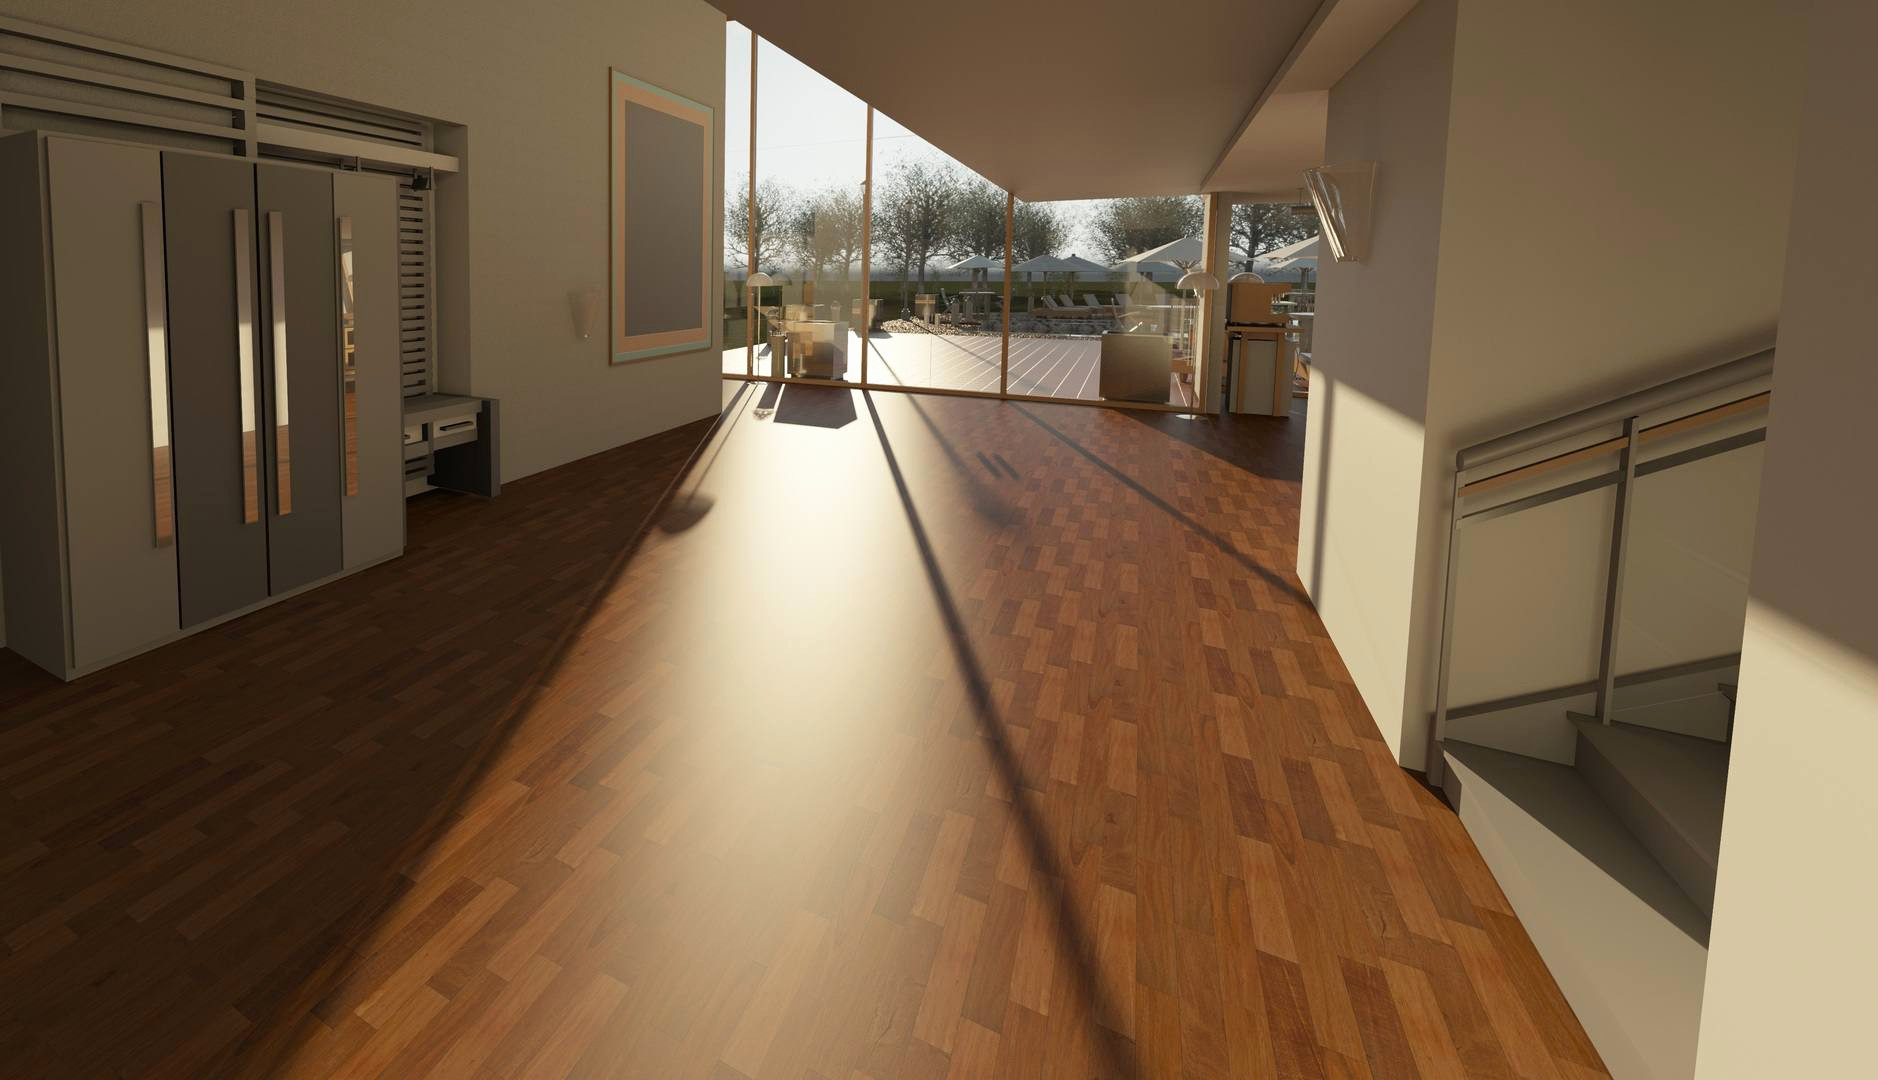 vinyl plank flooring vs hardwood of 54 unique vinyl wood plank flooring durability mobel ideen site regarding architecture wood house floor interior window pxhere 5ba27a2cc9e77c b27b9